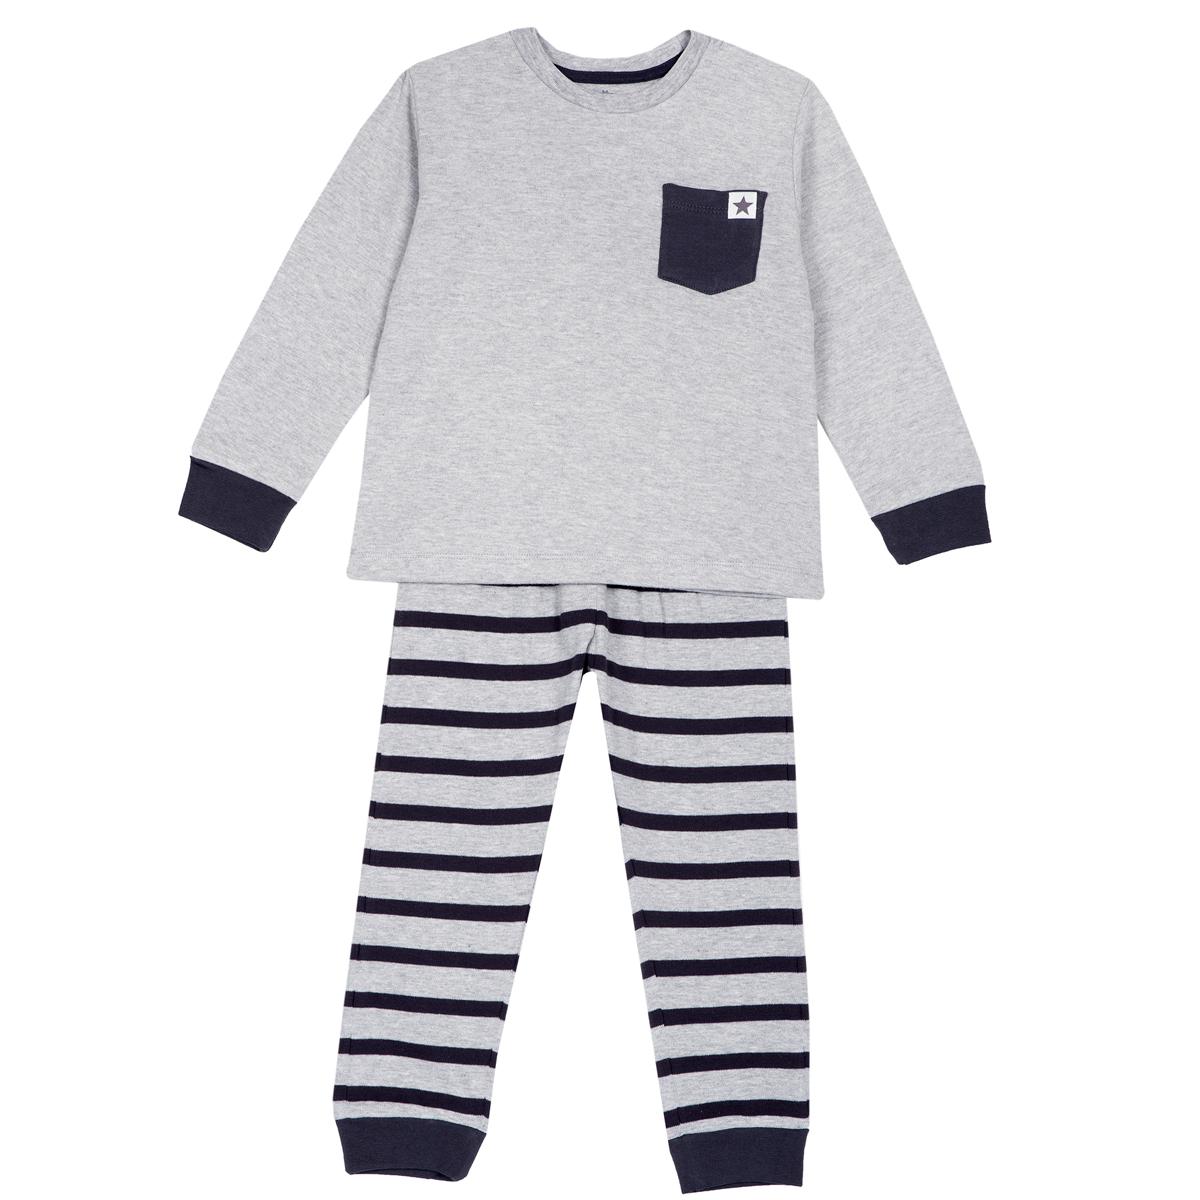 Pijama copii Chicco, maneca lunga, gri deschis, 31285 din categoria Pijamale copii